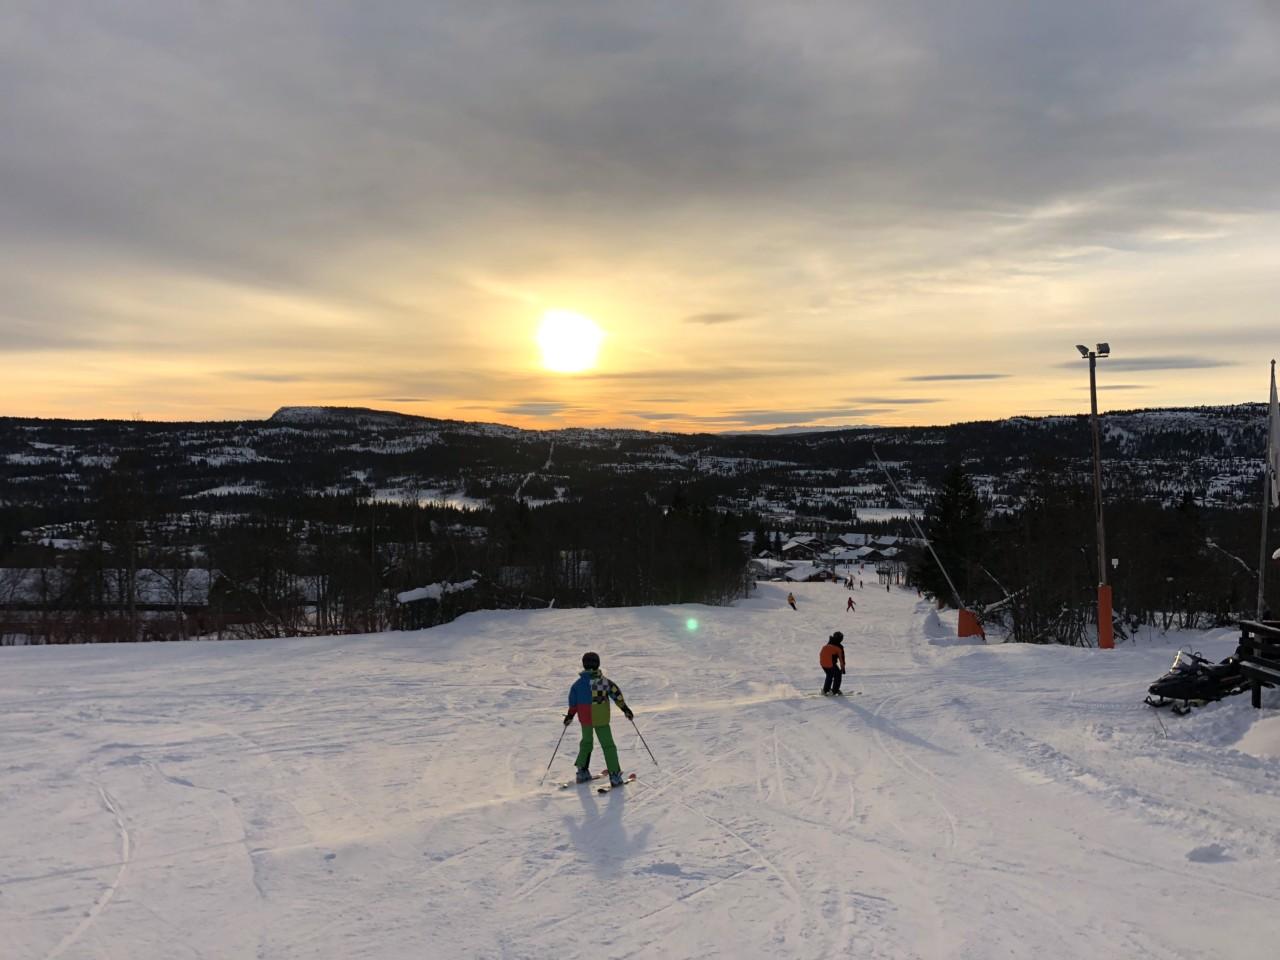 skeikampen-slalom-snowboard-sno-vinter-green-house